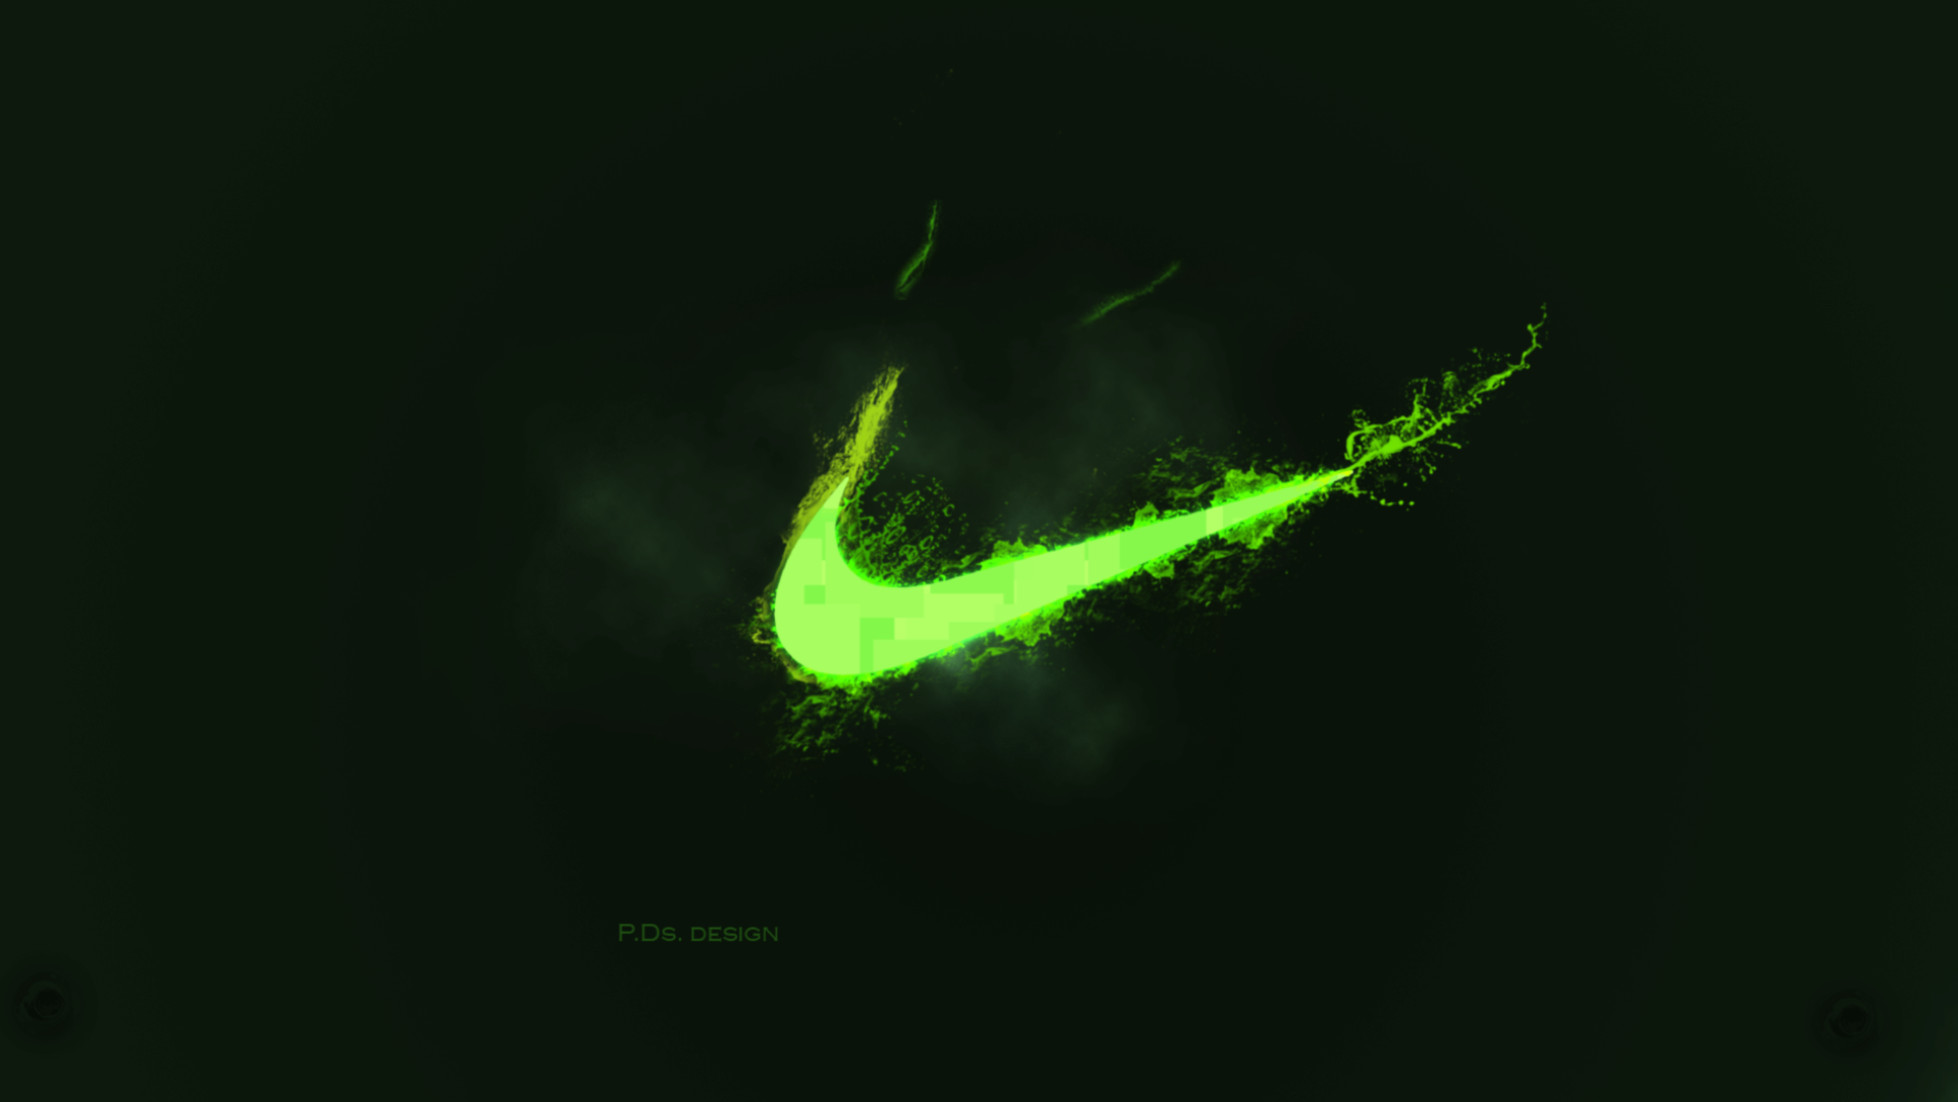 Cool Nike Wallpaper – Widescreen HD Wallpapers